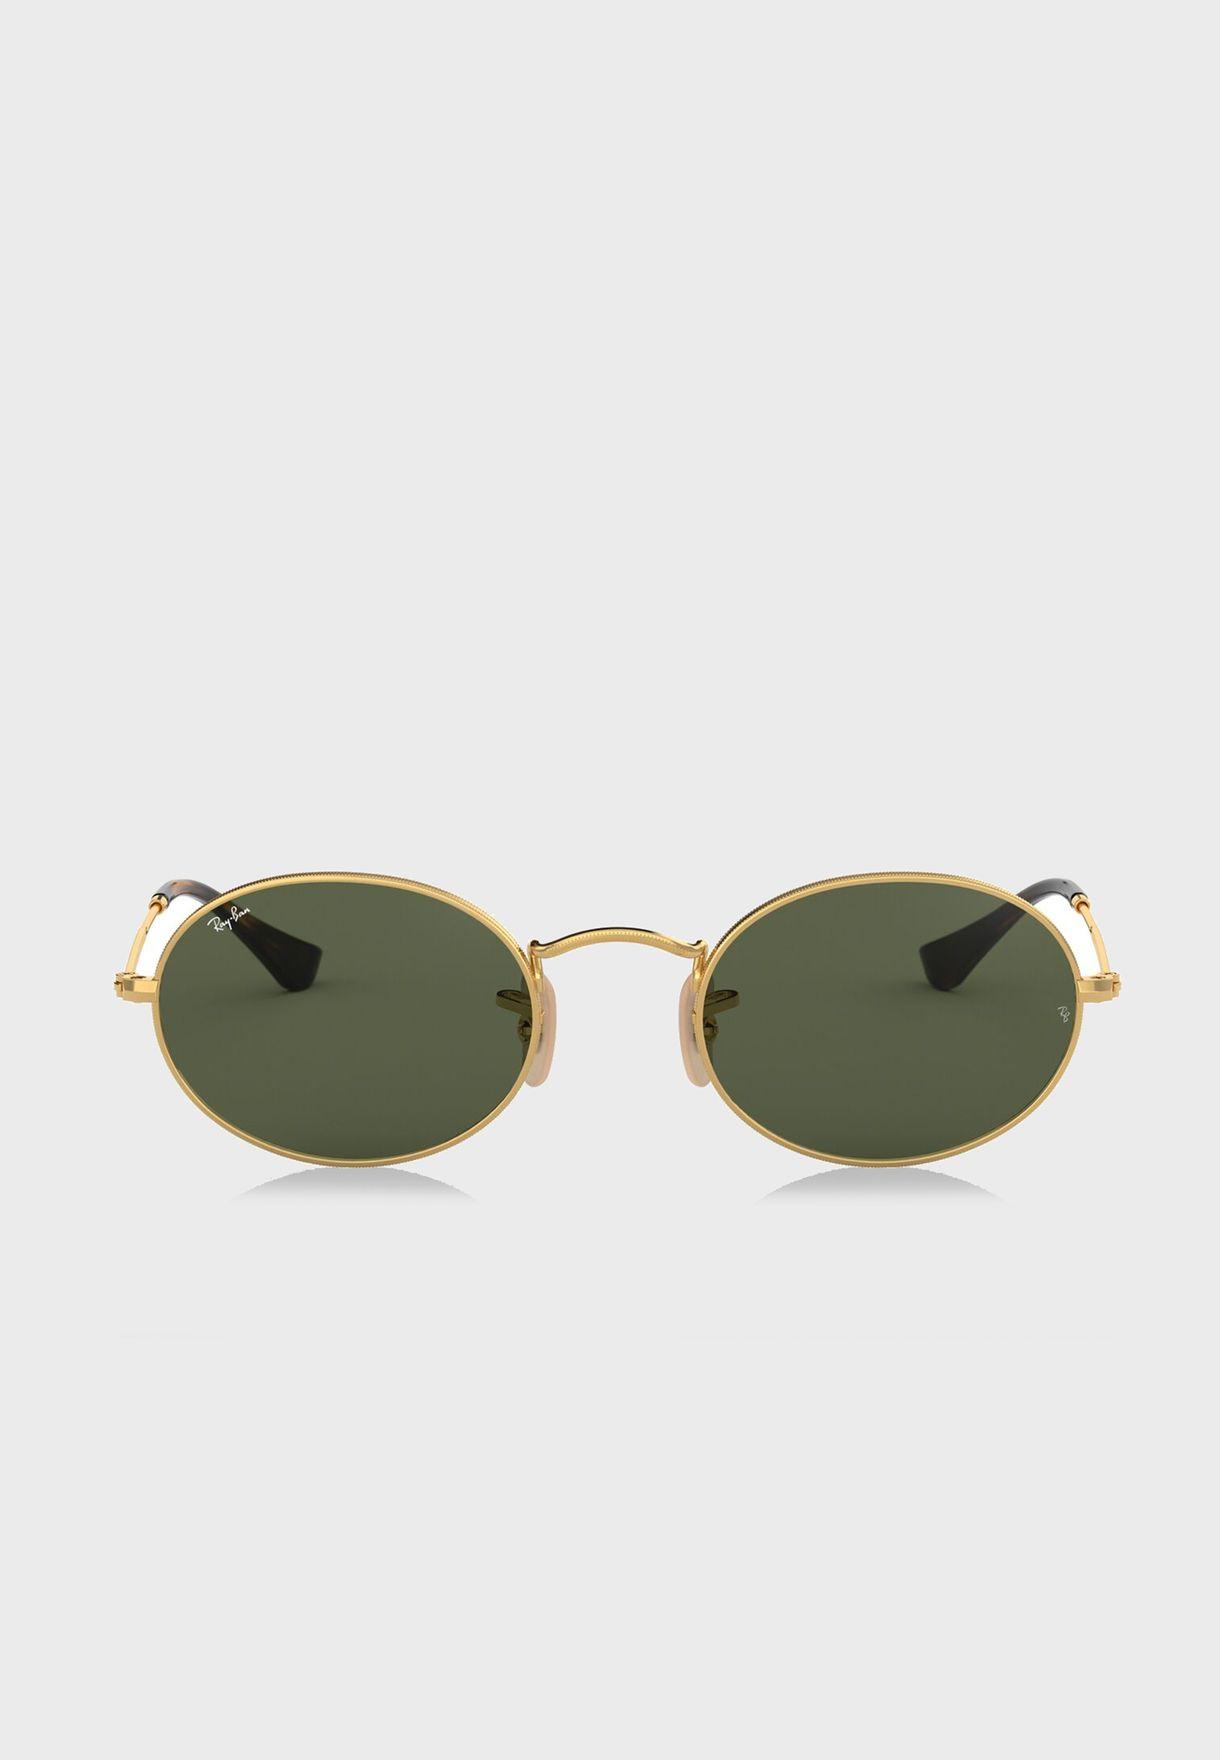 b80836a0375 Shop Ray-Ban gold 0RB3547N Oval Flat Lenses Sunglasses 8053672611526 ...